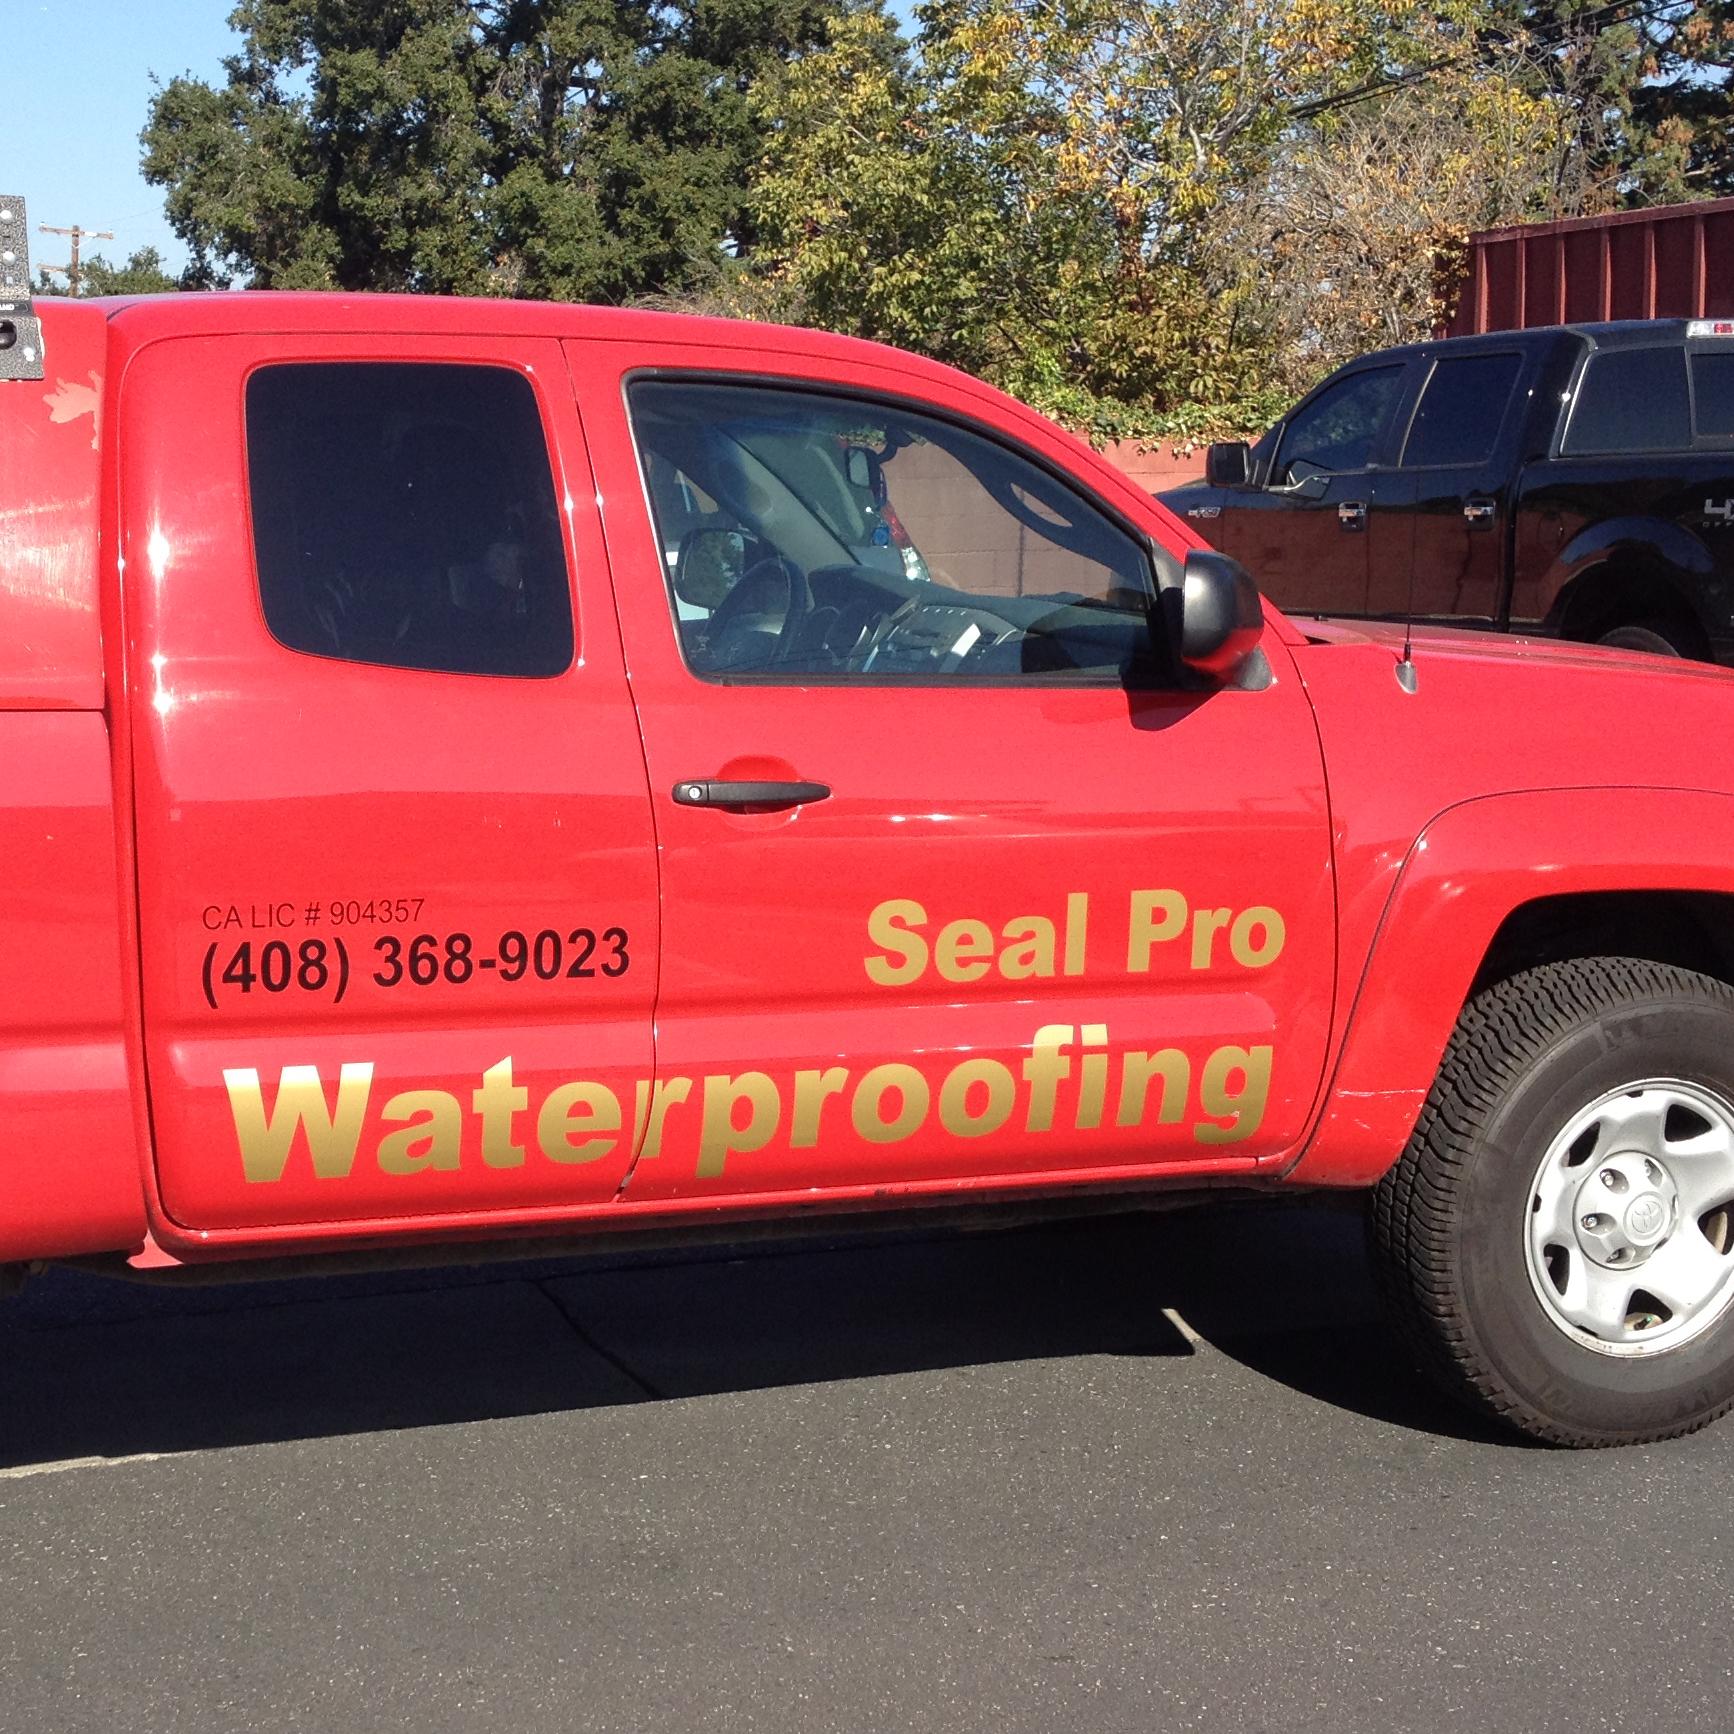 Seal Pro Vehicle Graphics